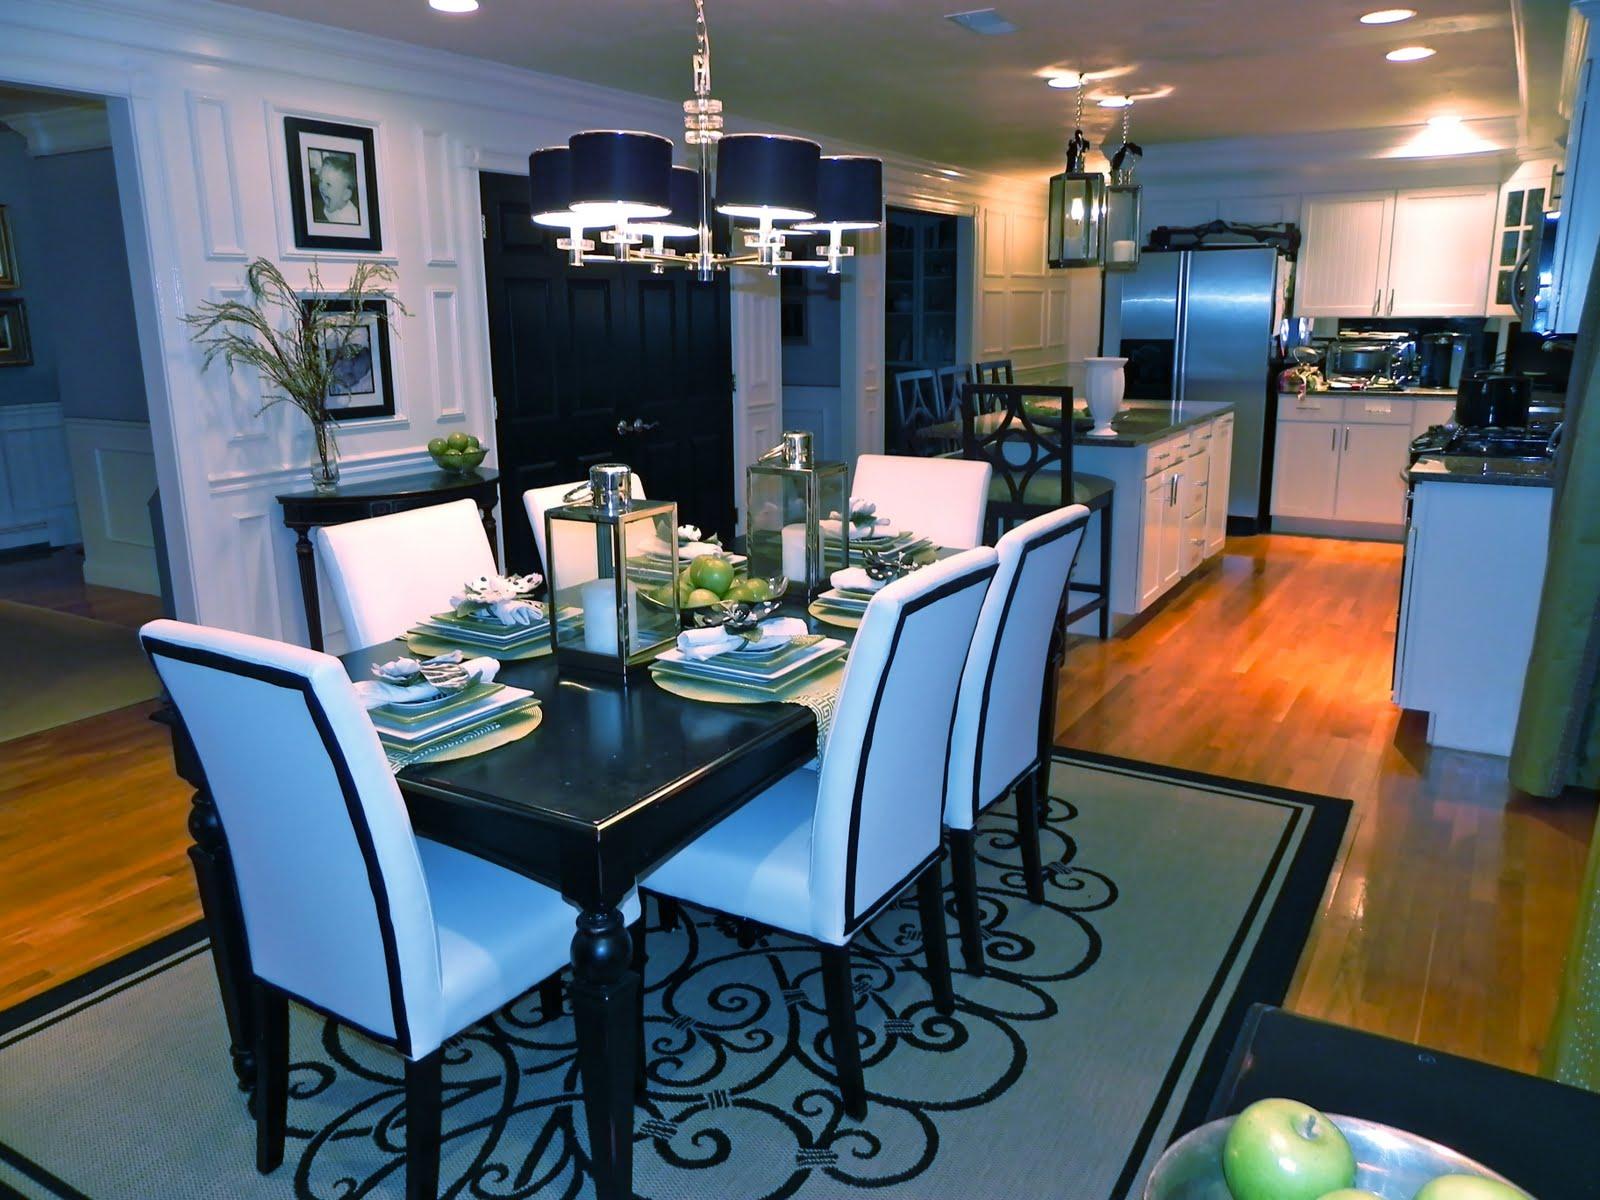 Adorable 20 Best Interior Decorating Blogs Design Ideas Of The Best